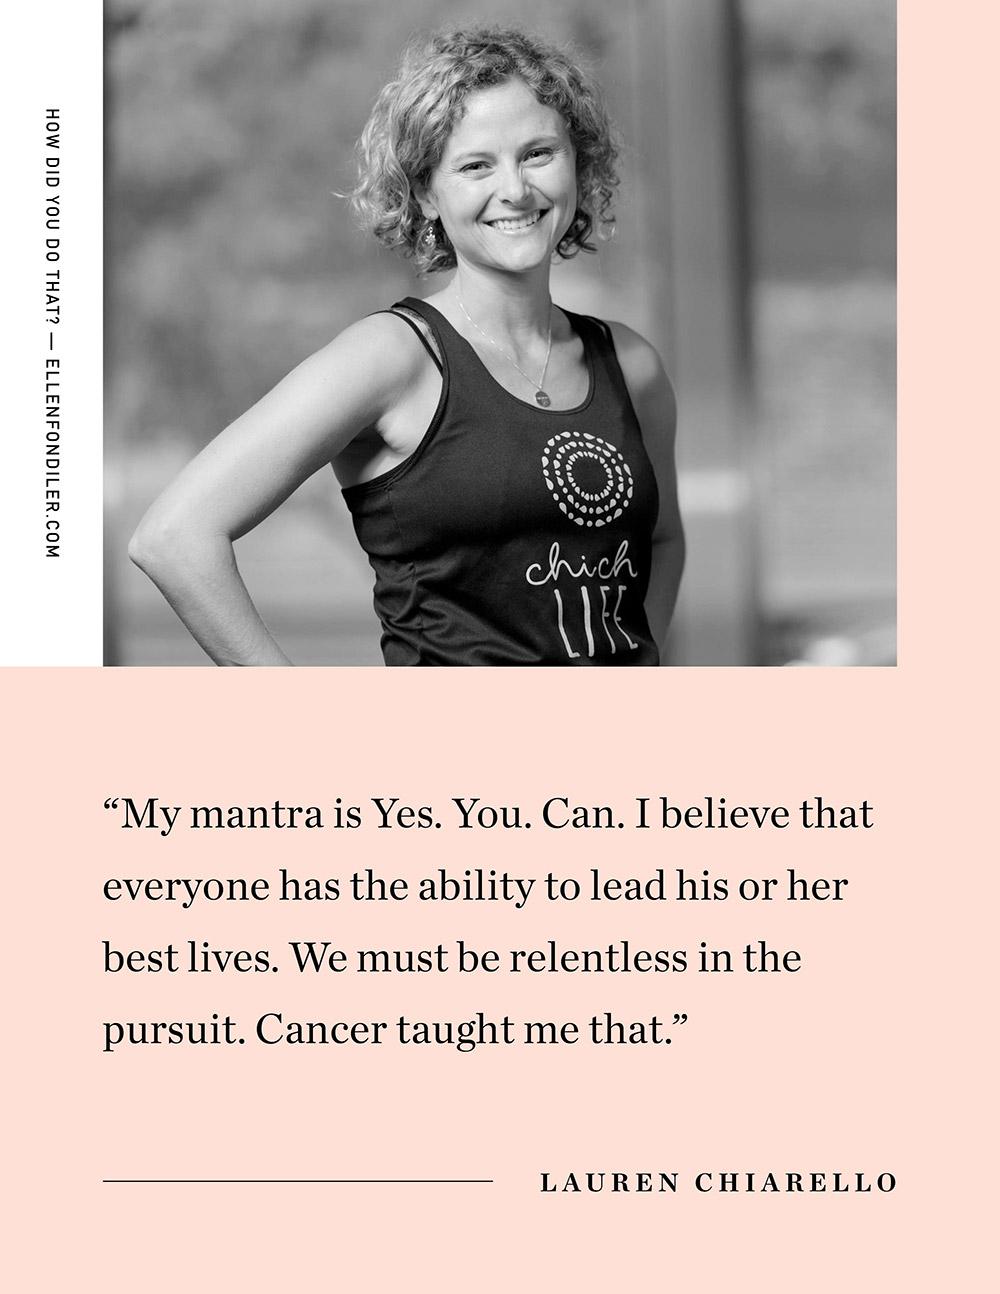 Ellen Fondiler | An Interview with Lauren Chiarello